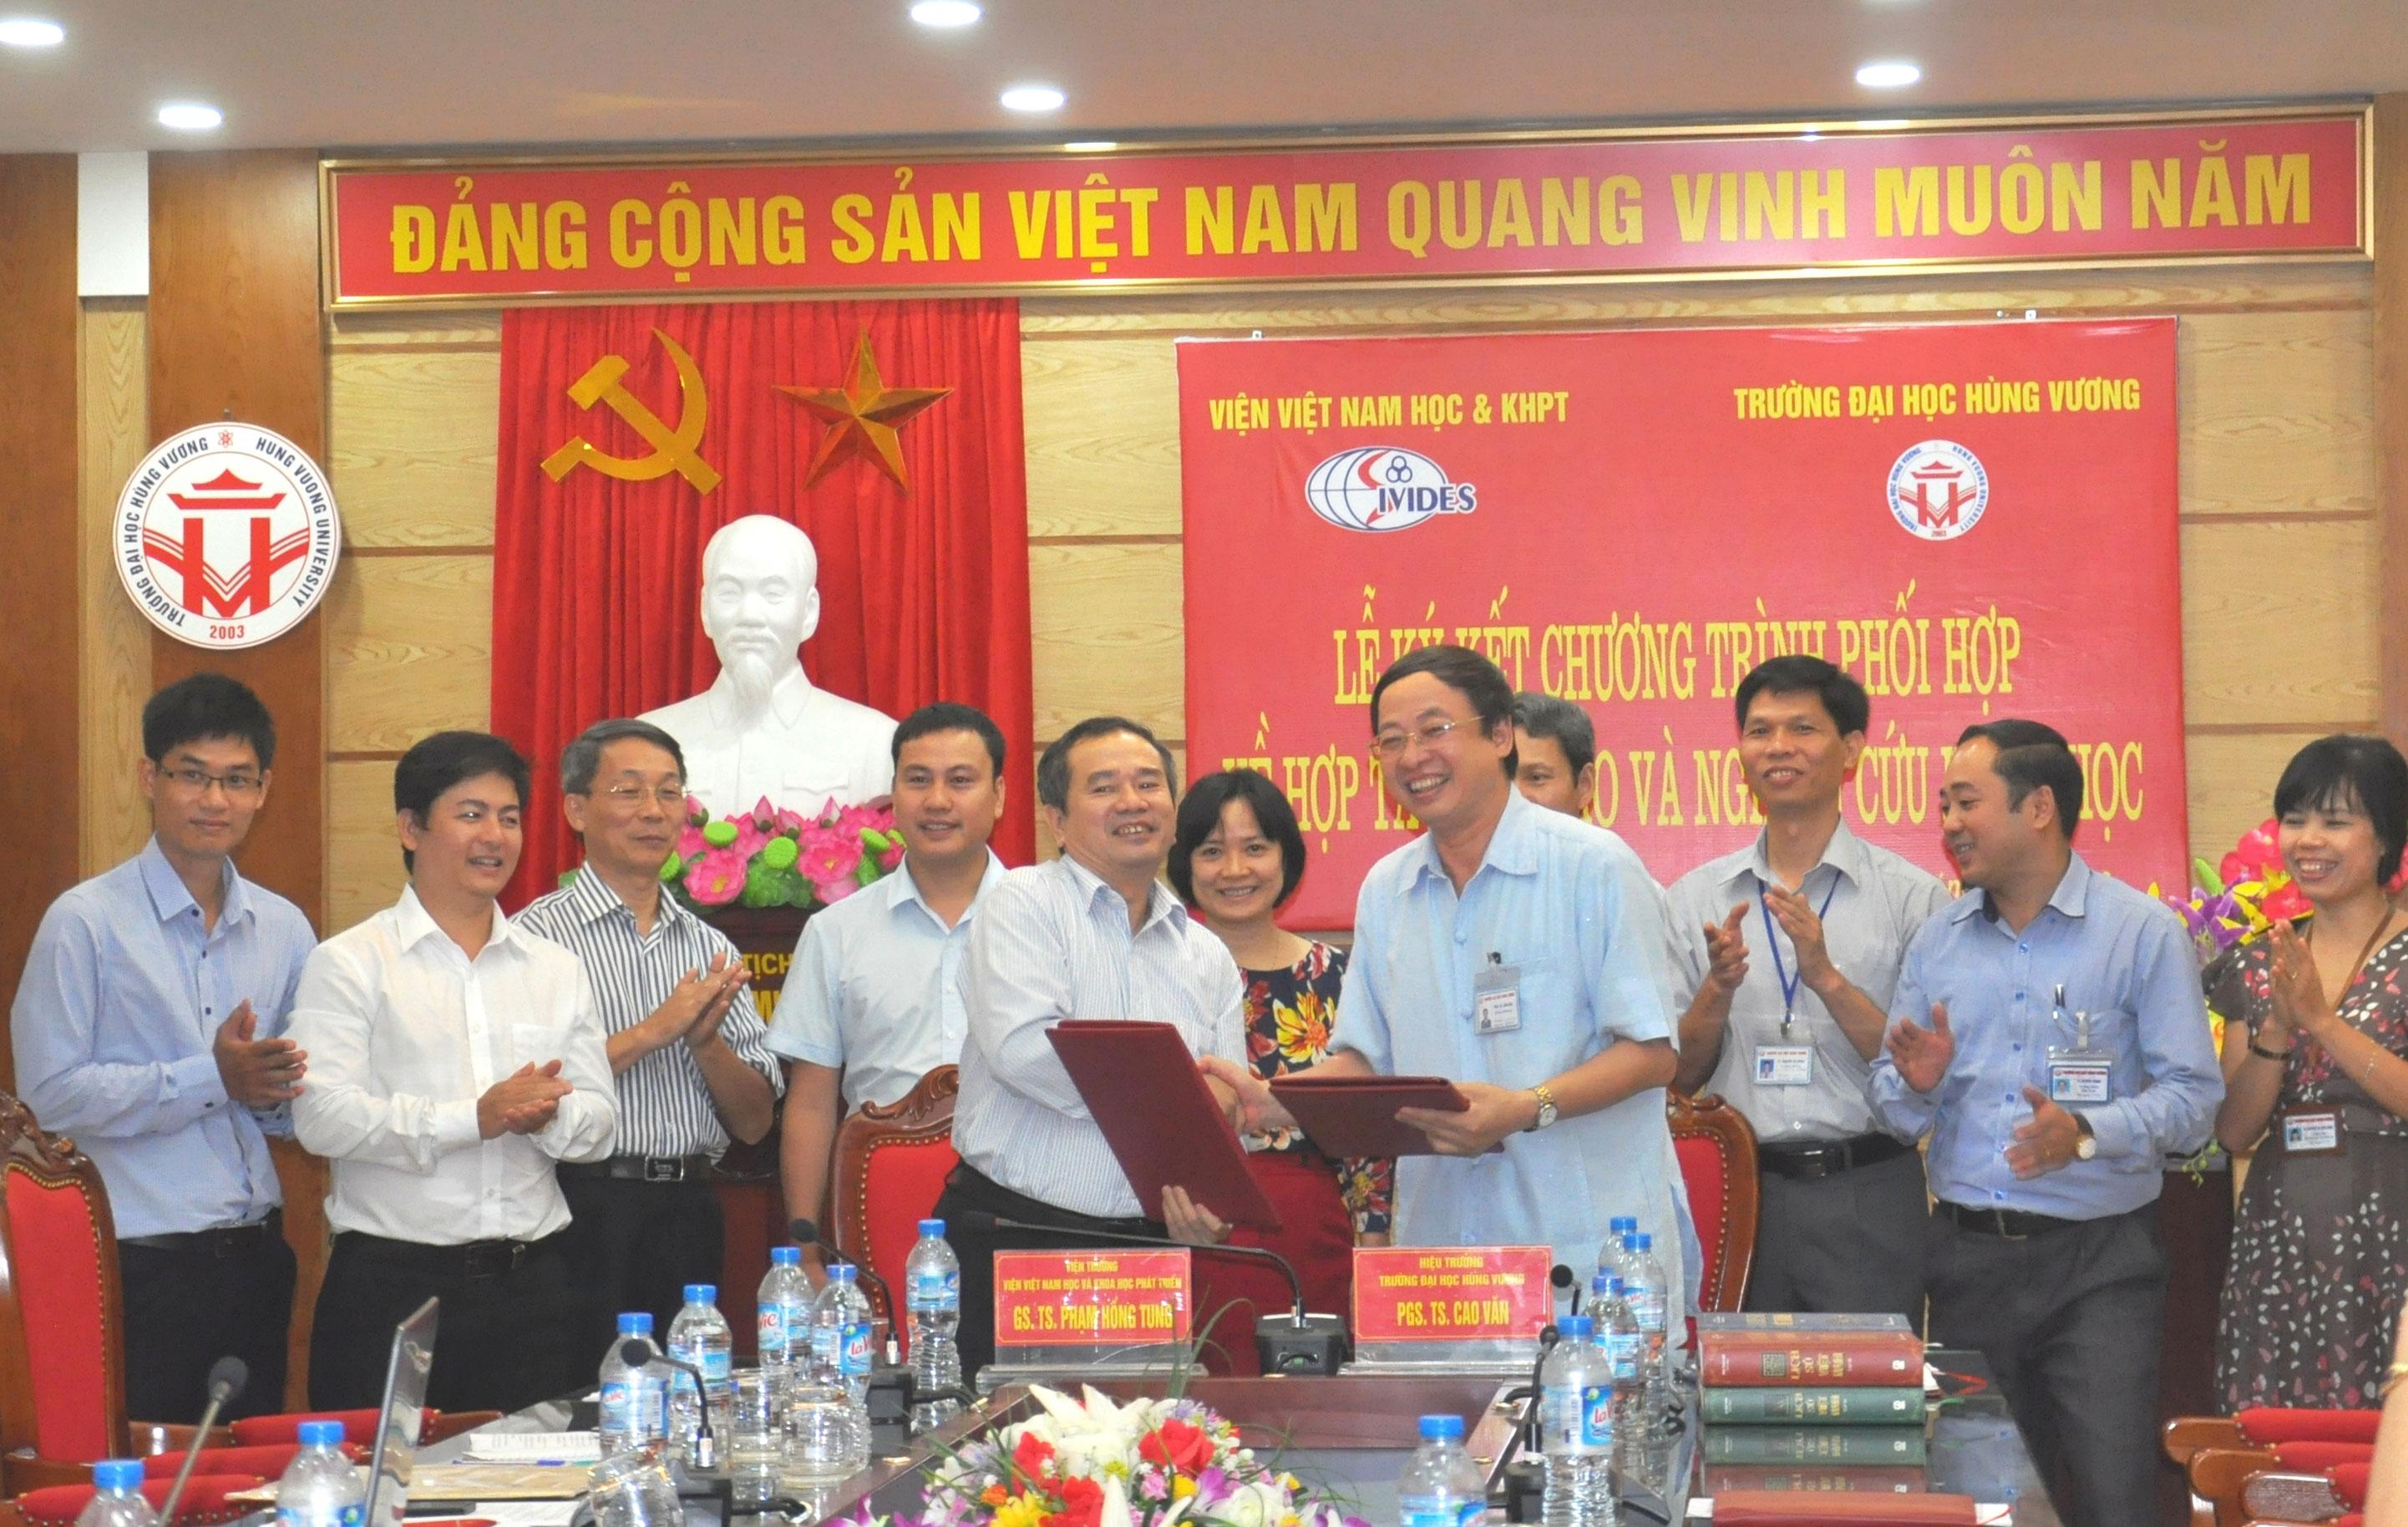 Le ky ket Chuong trinh phoi hop giua Truong Dai hoc Hung Vuong va Vien Viet Nam hoc va Khoa hoc phat trien, Dai hoc Quoc gia Ha Noi